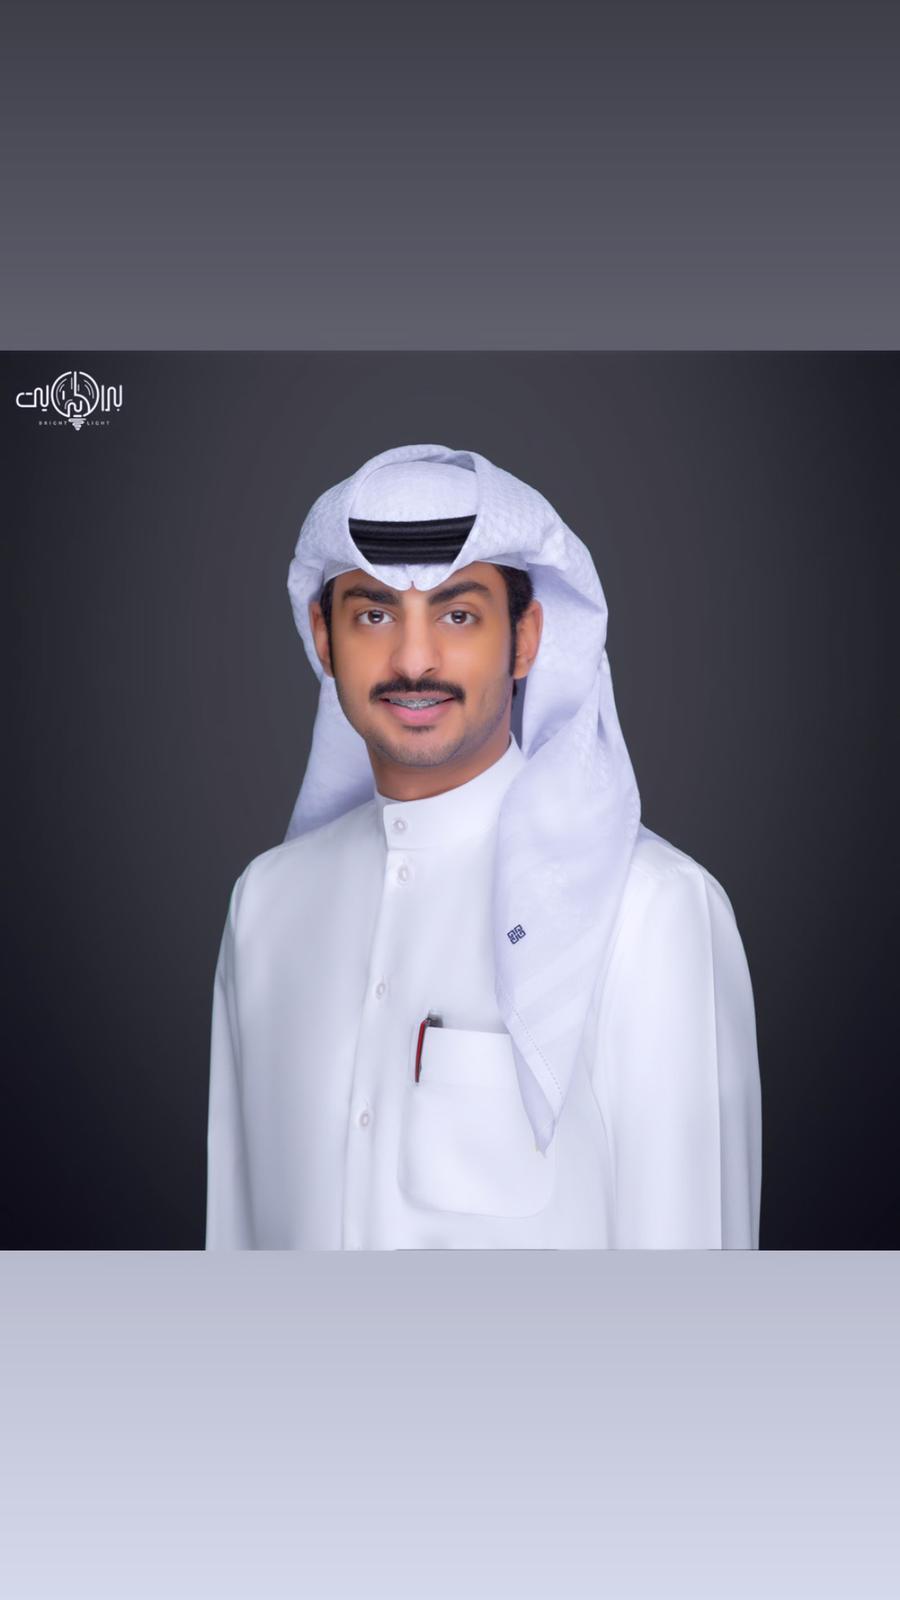 Omar Mubark Rasheed ALheefi Becomes Kuwait's Leading Social Media Influencer